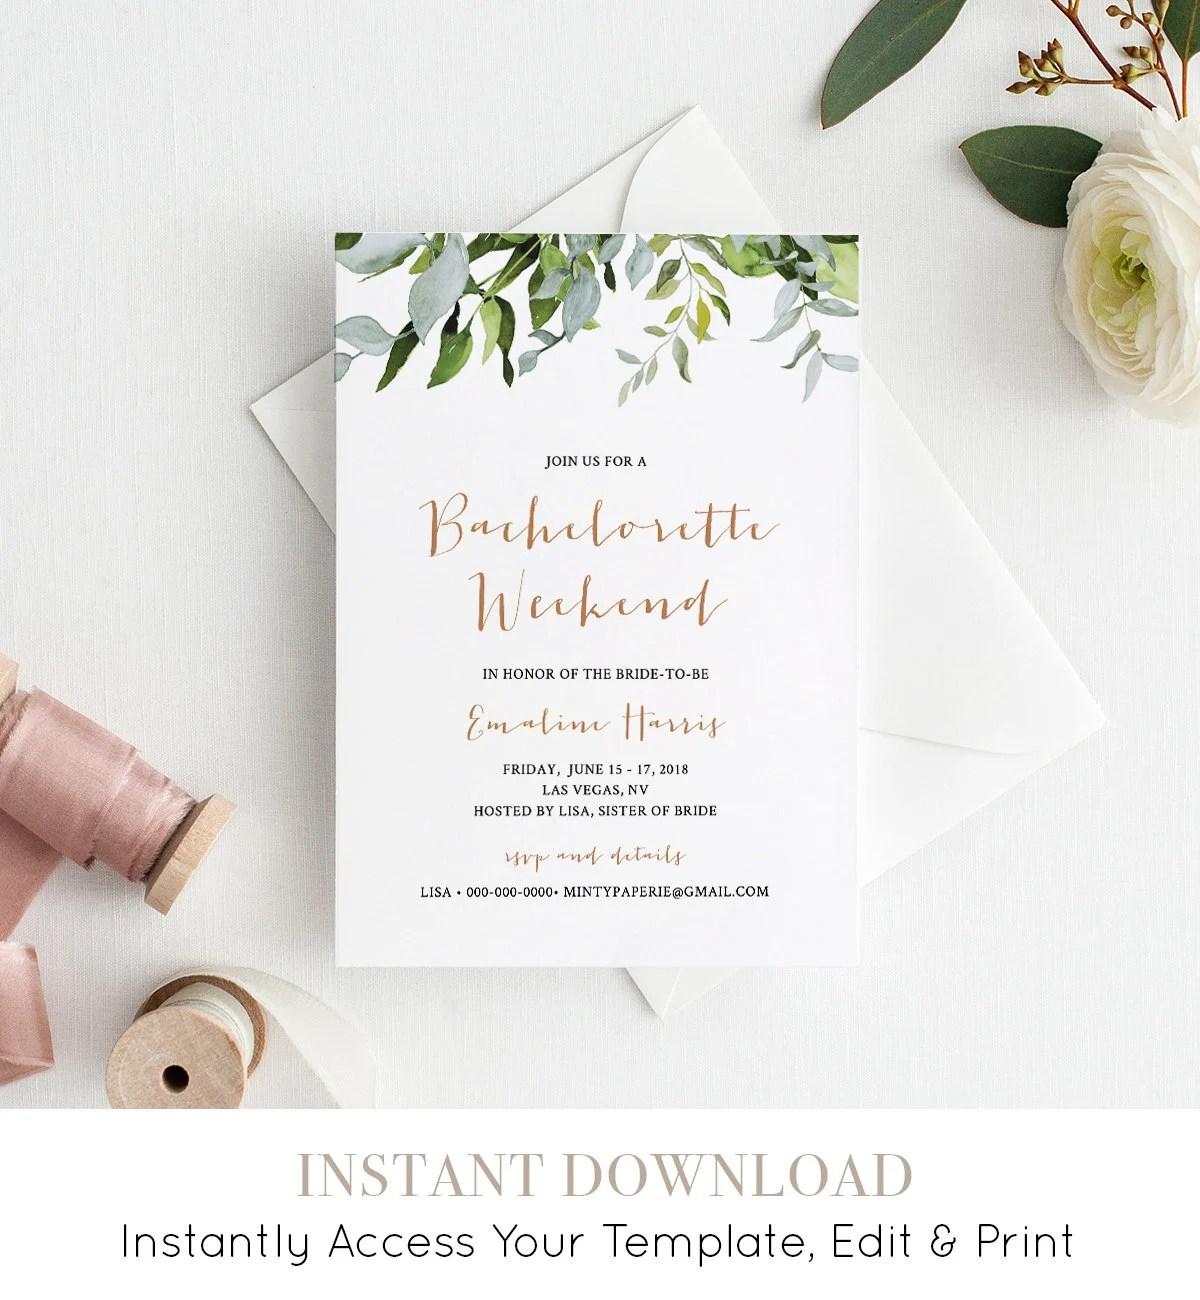 bachelorette party weekend invitation